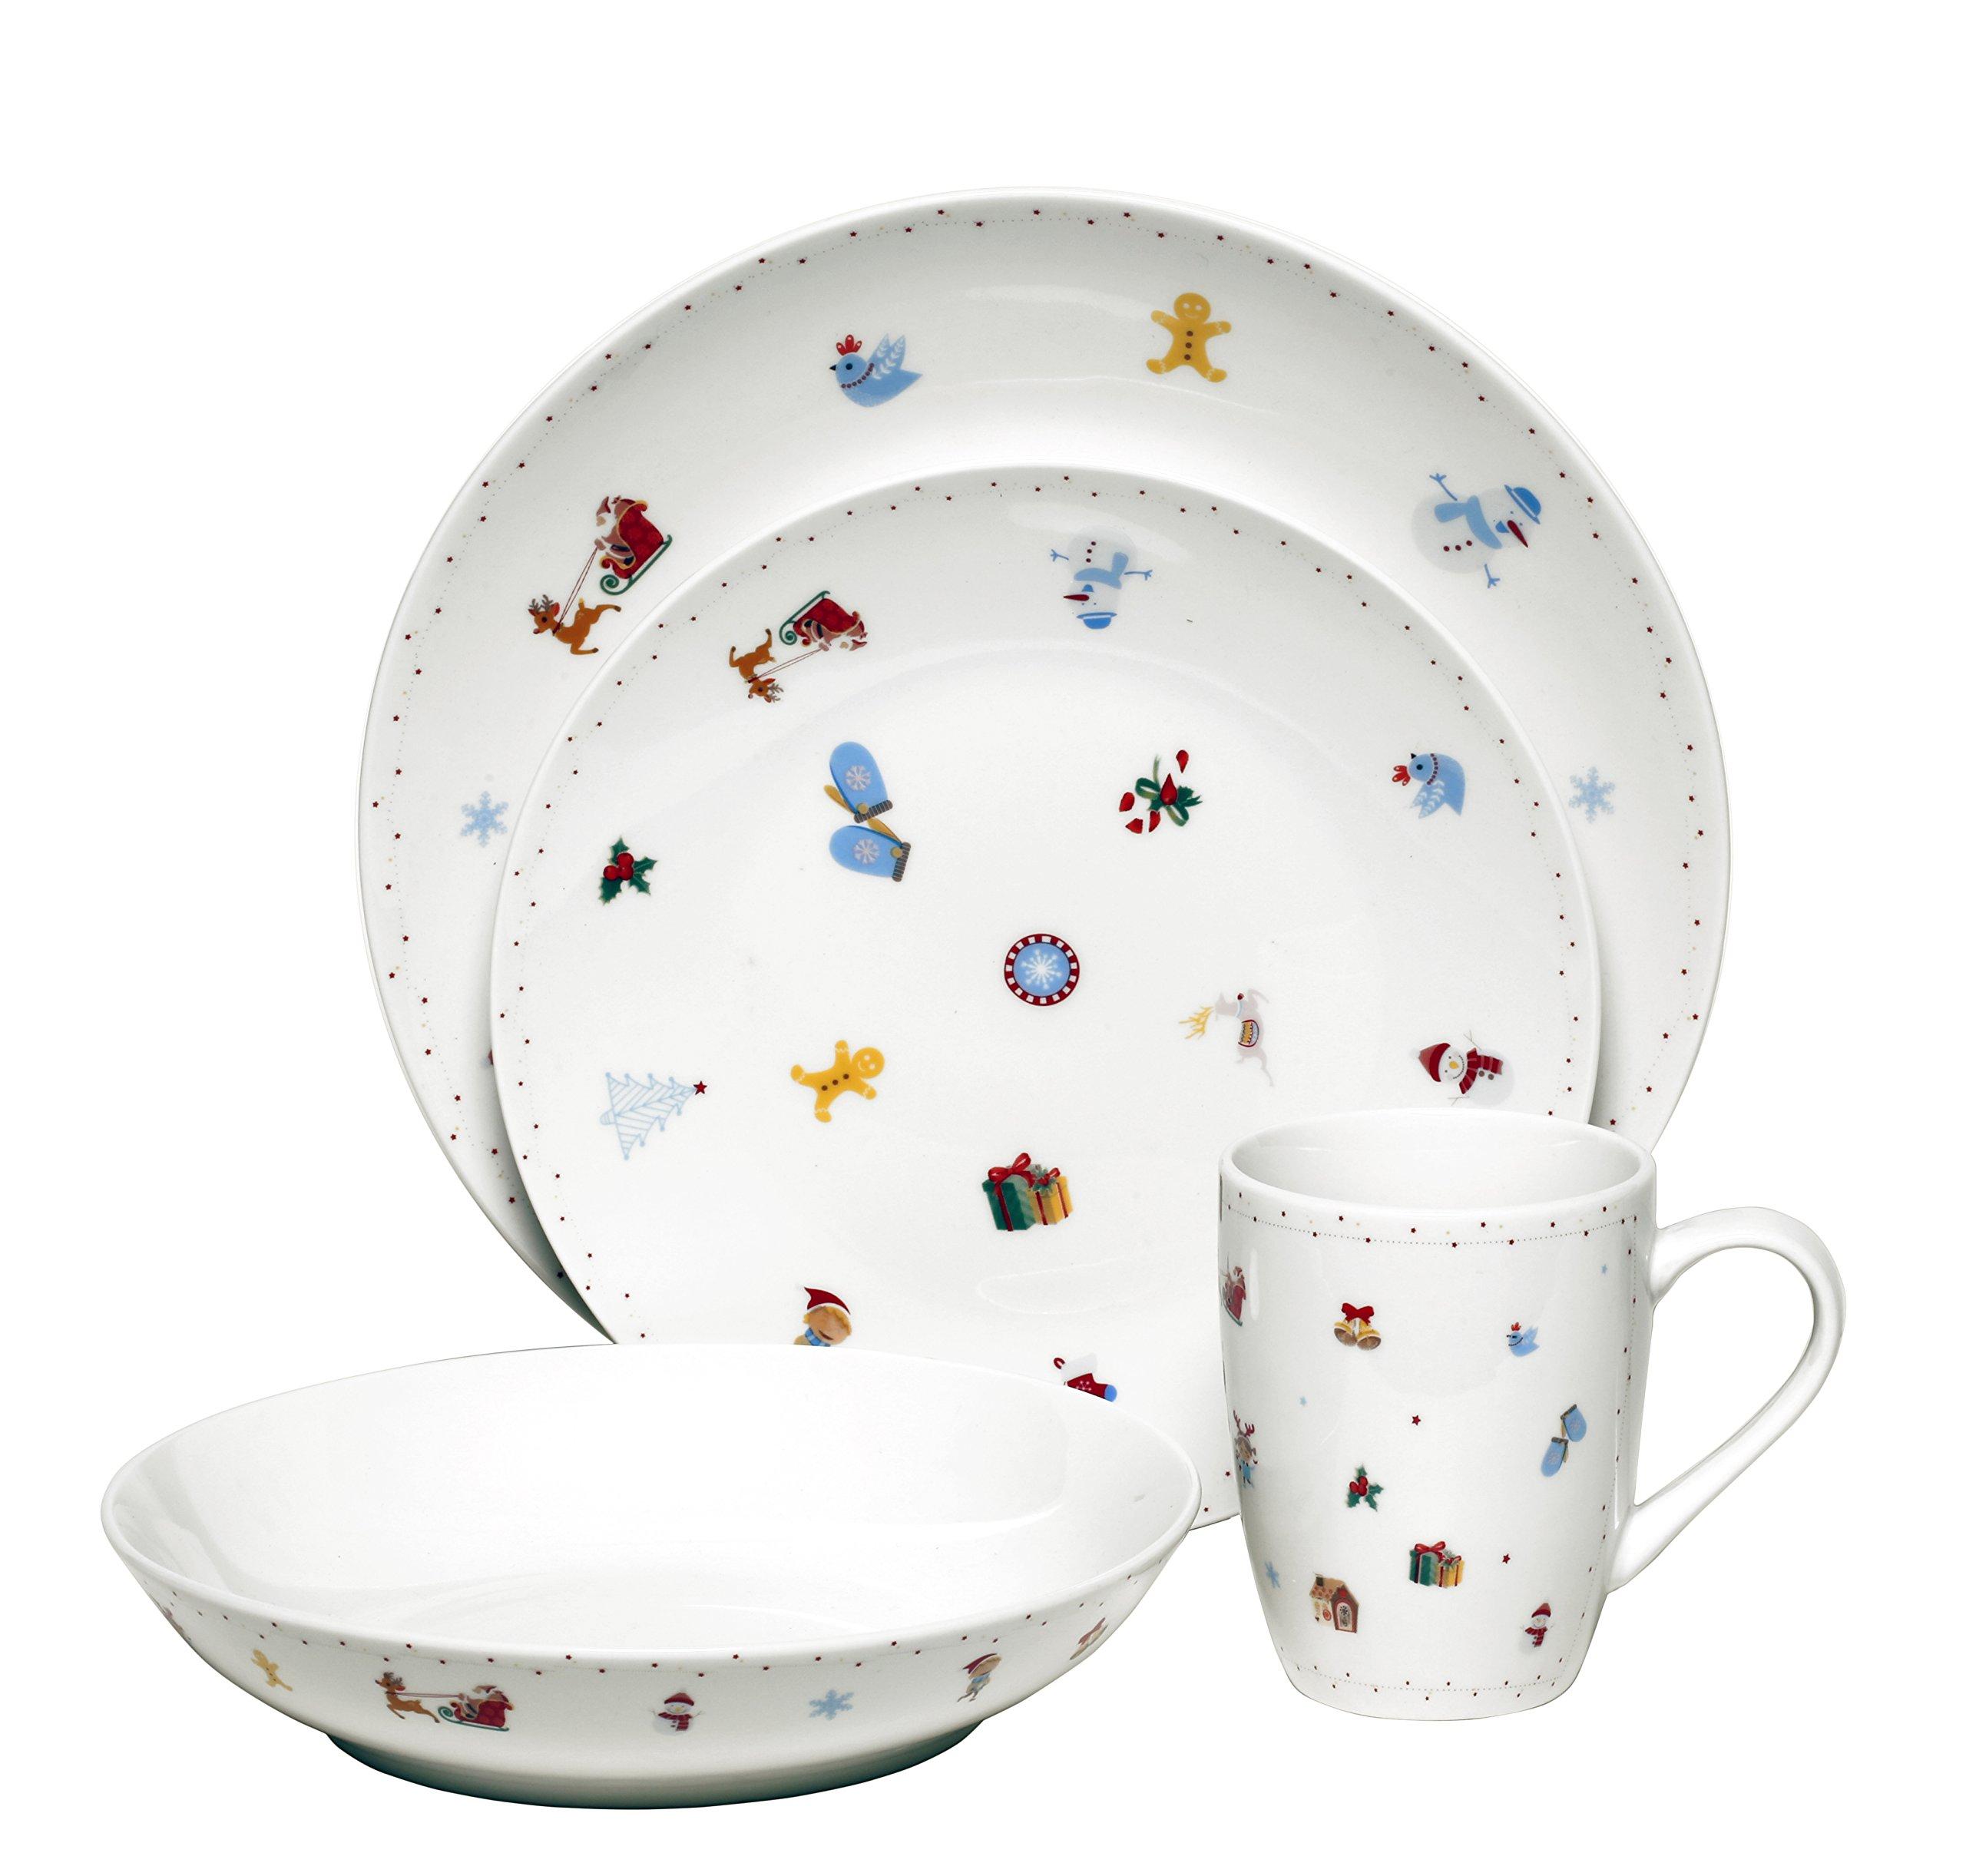 Melange Chisrtmas Party Ceramic 32-Piece Place Setting, Serving for 8